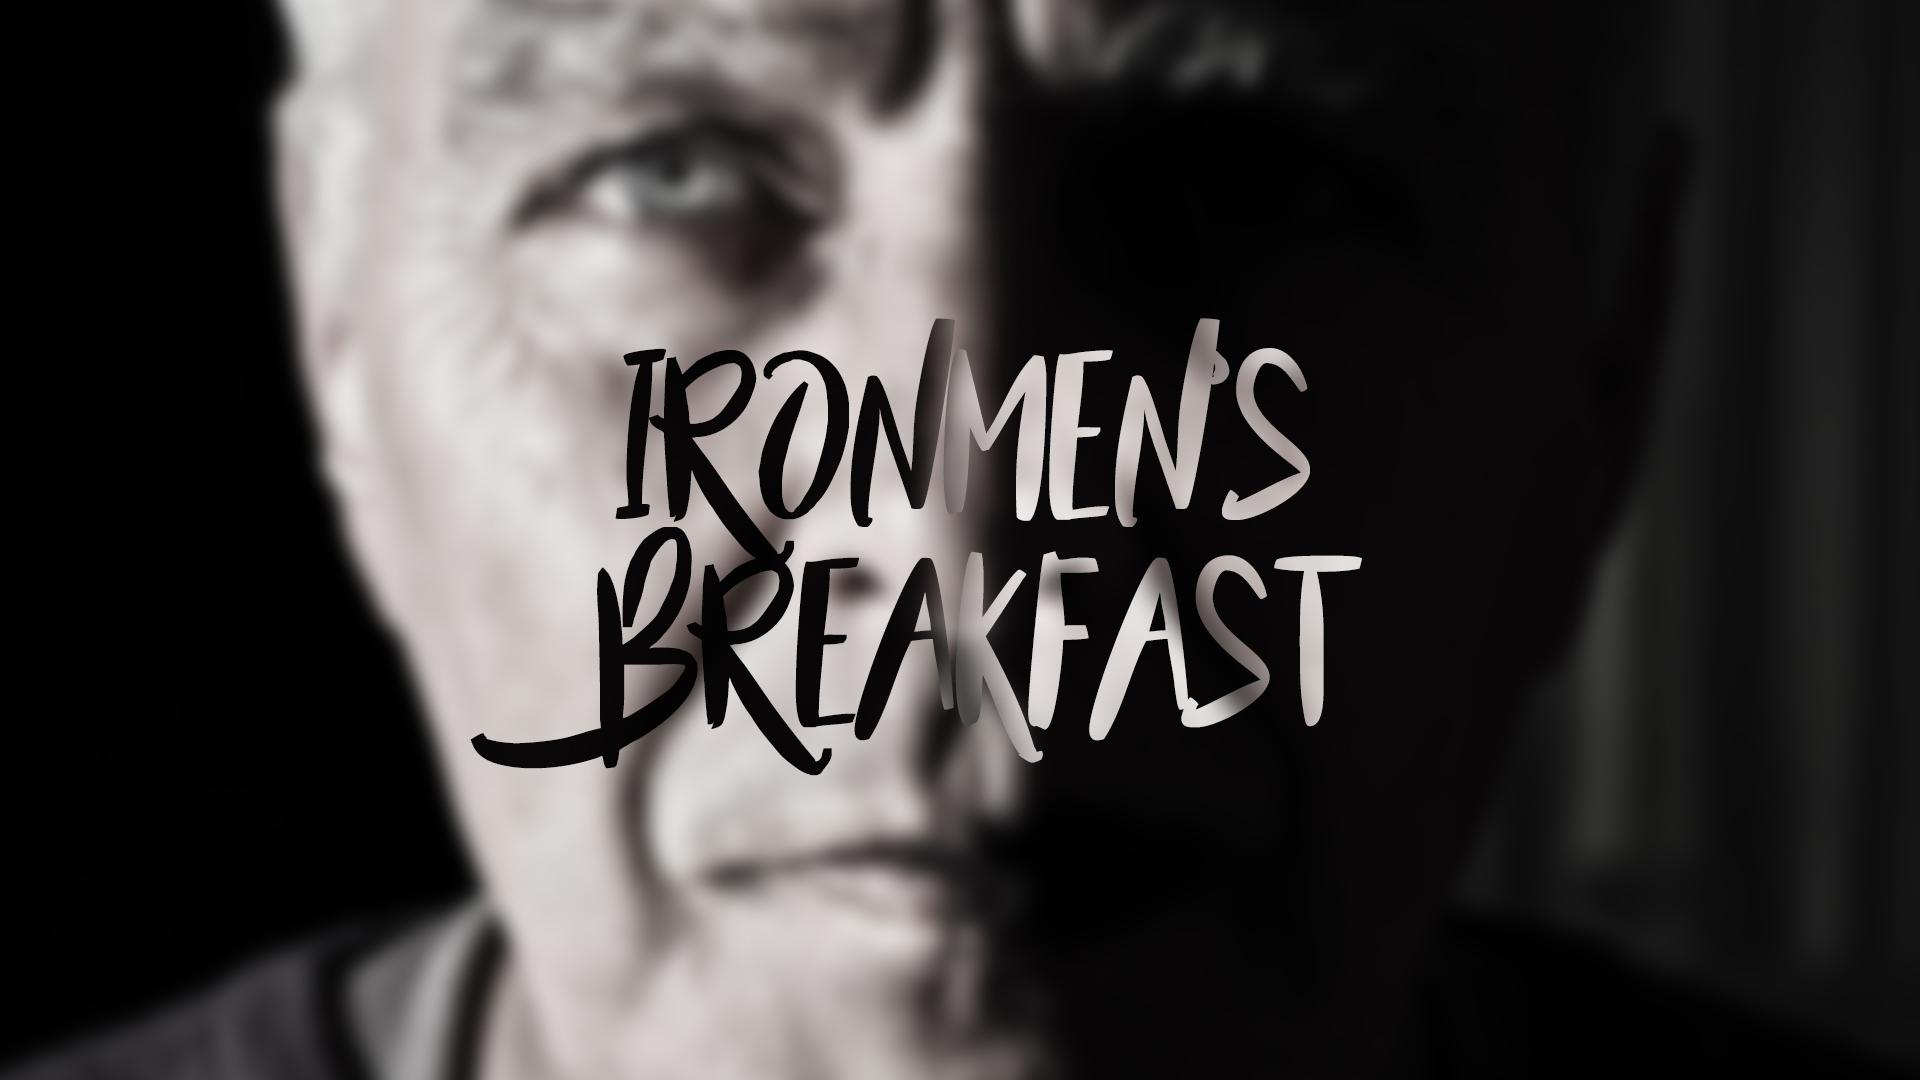 Ironmen sbreakfast event 2017